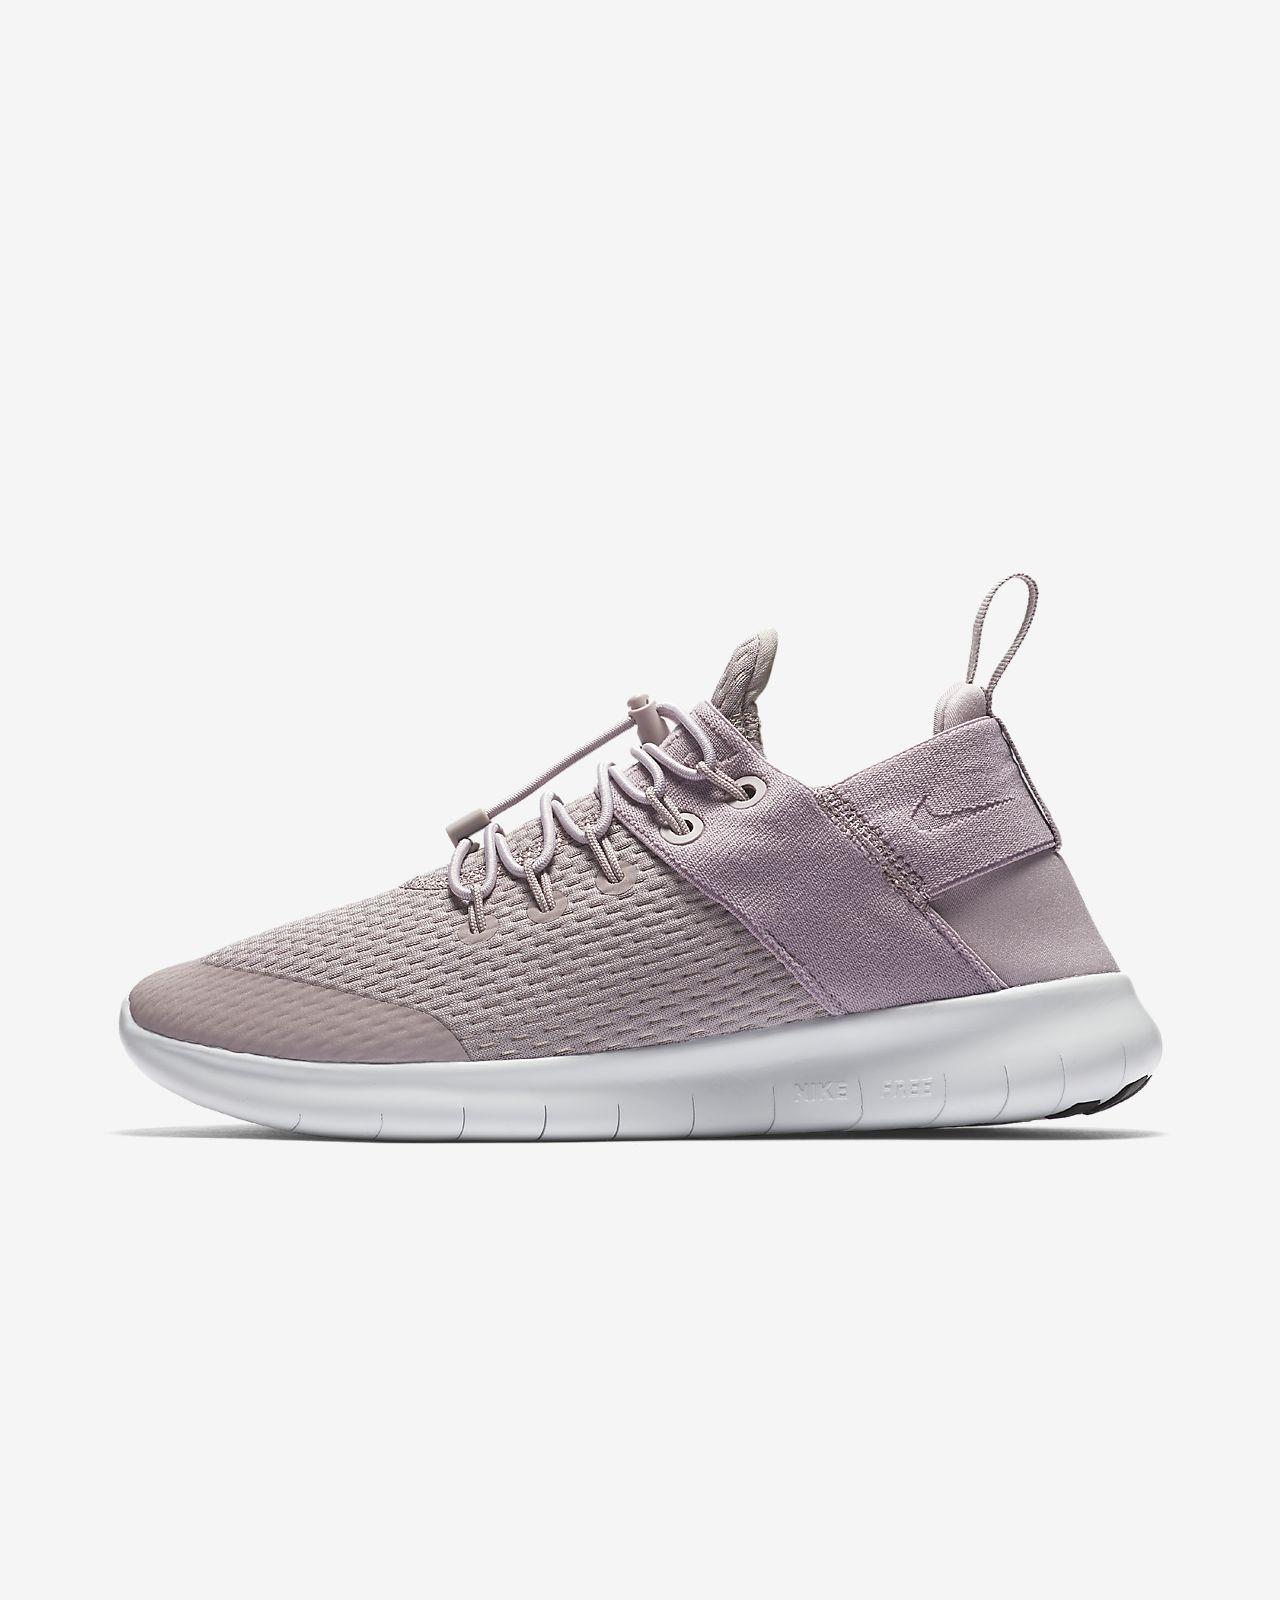 d536c046d79 ... wholesale nike free rn commuter 2017 womens running shoe c1189 c51d3